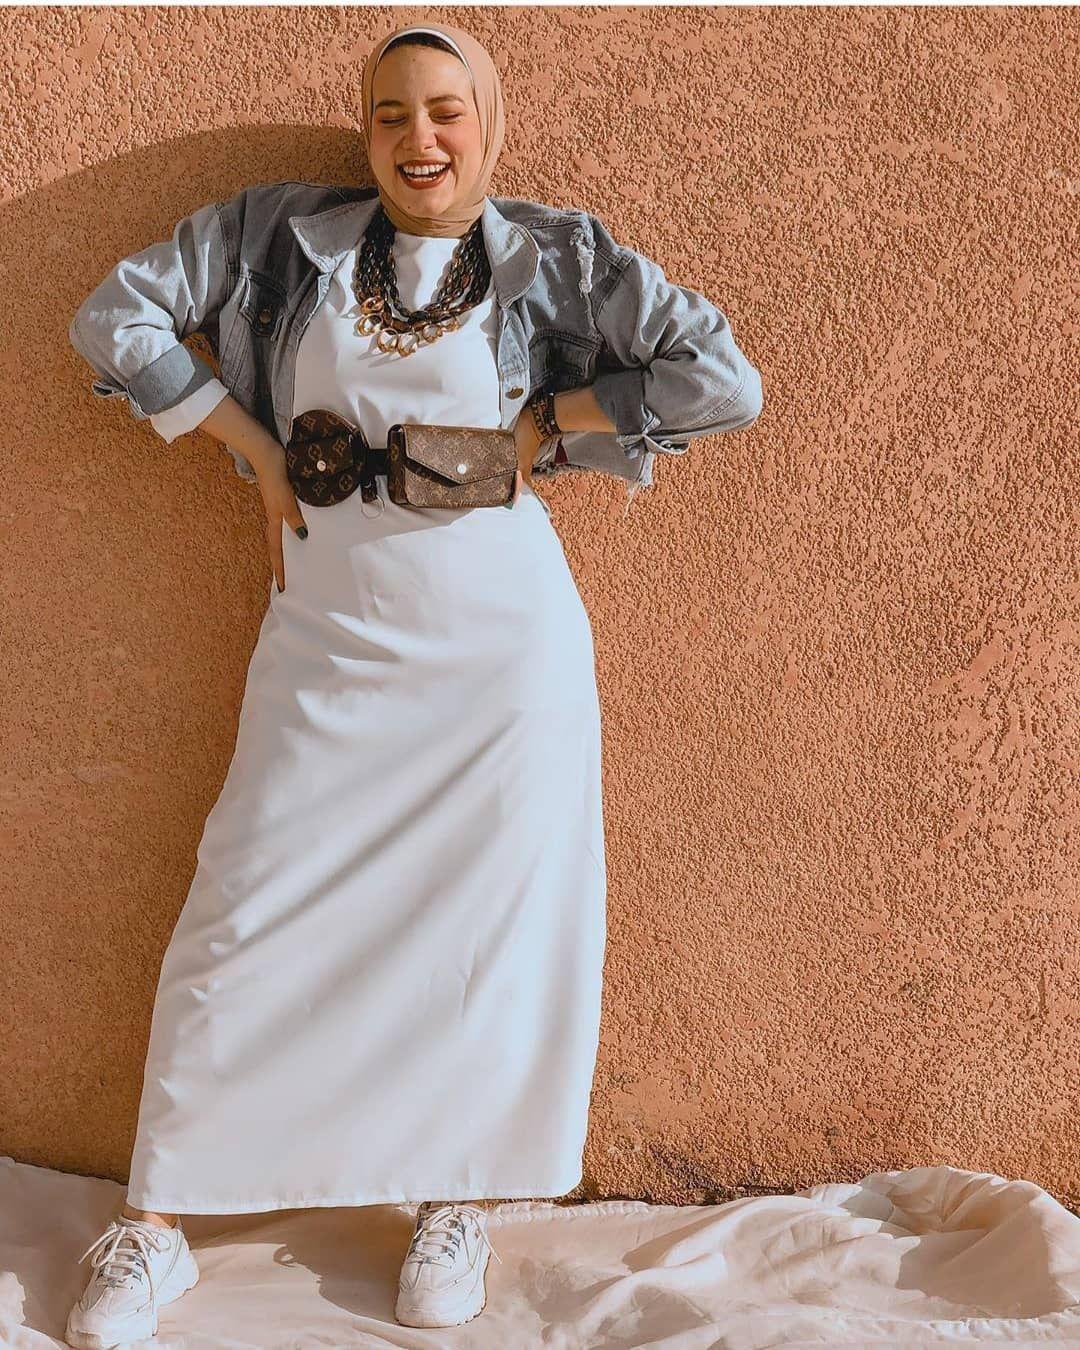 Dorktya Boutique On Instagram طرق مختلفه للبيزك دريس الوان جديده و القديمه كلها موجوده اساسيات كل دولاب ولااازم يكون موجود م Fashion Hijab Fashion Maxi Skirt